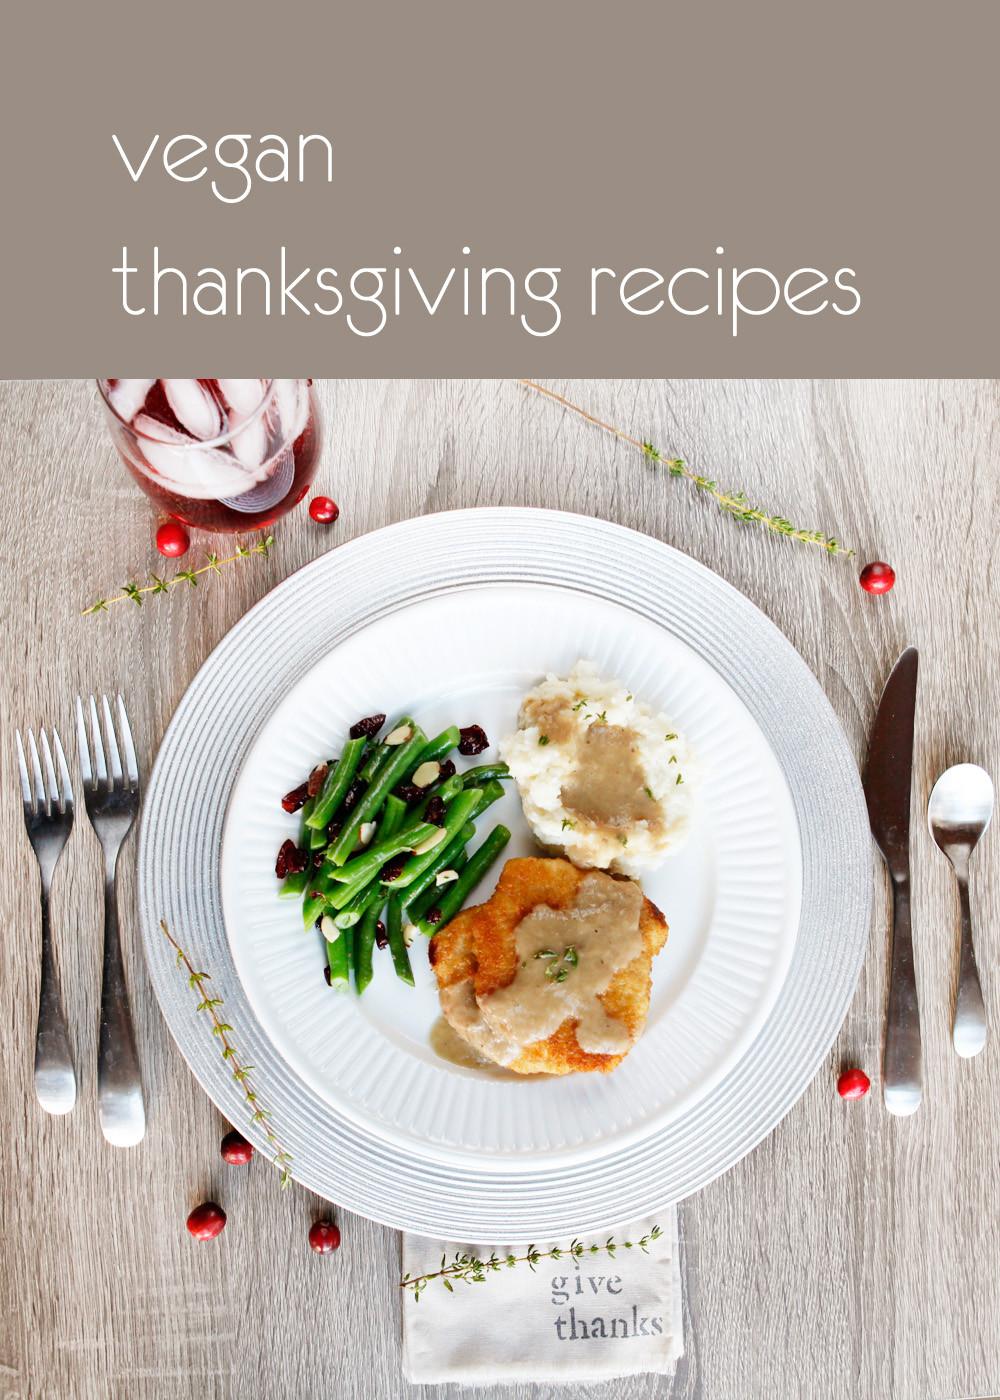 Simple Vegetarian Thanksgiving Recipes  easy vegan thanksgiving recipes with thyme and cranberry